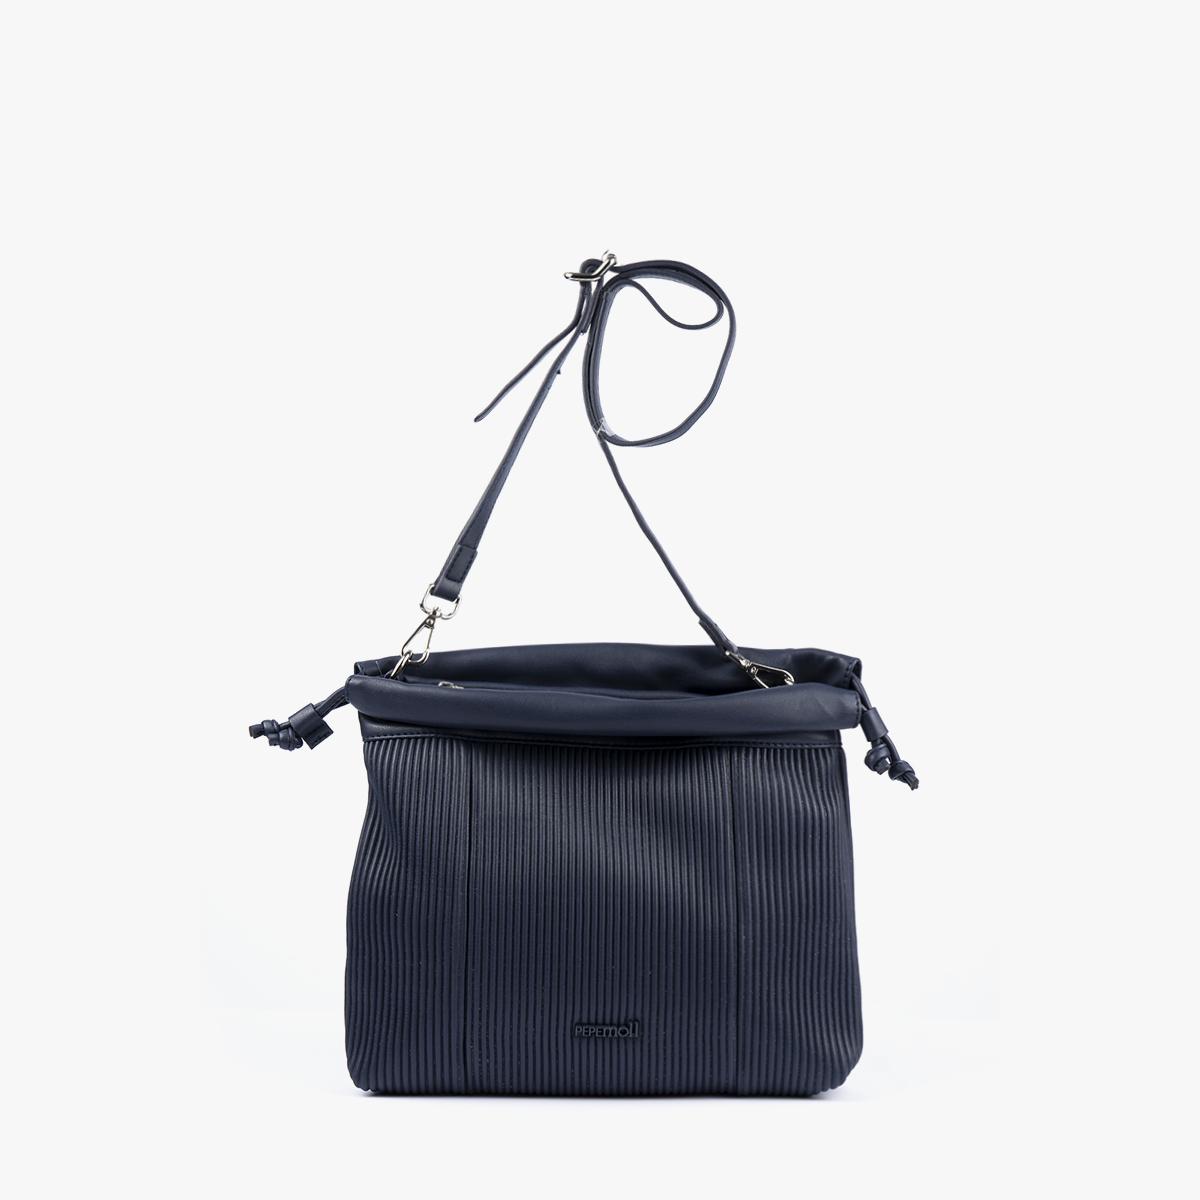 44121 bolso bandolera azul pepemoll